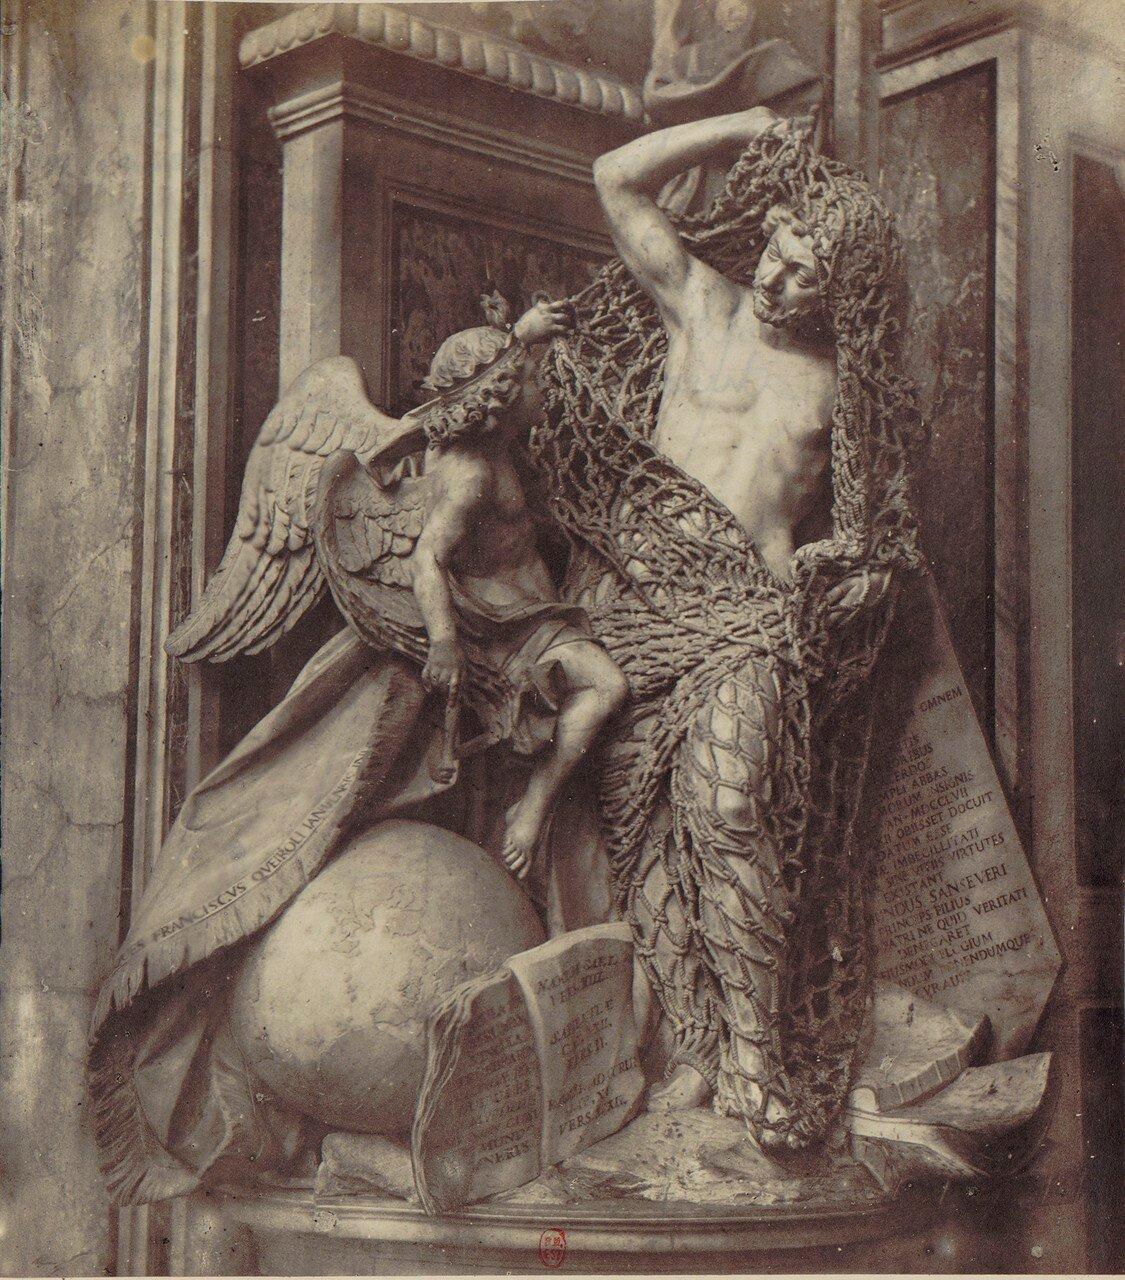 17. Капелла Сан-Северо. Скульптура «Избавление от чар»